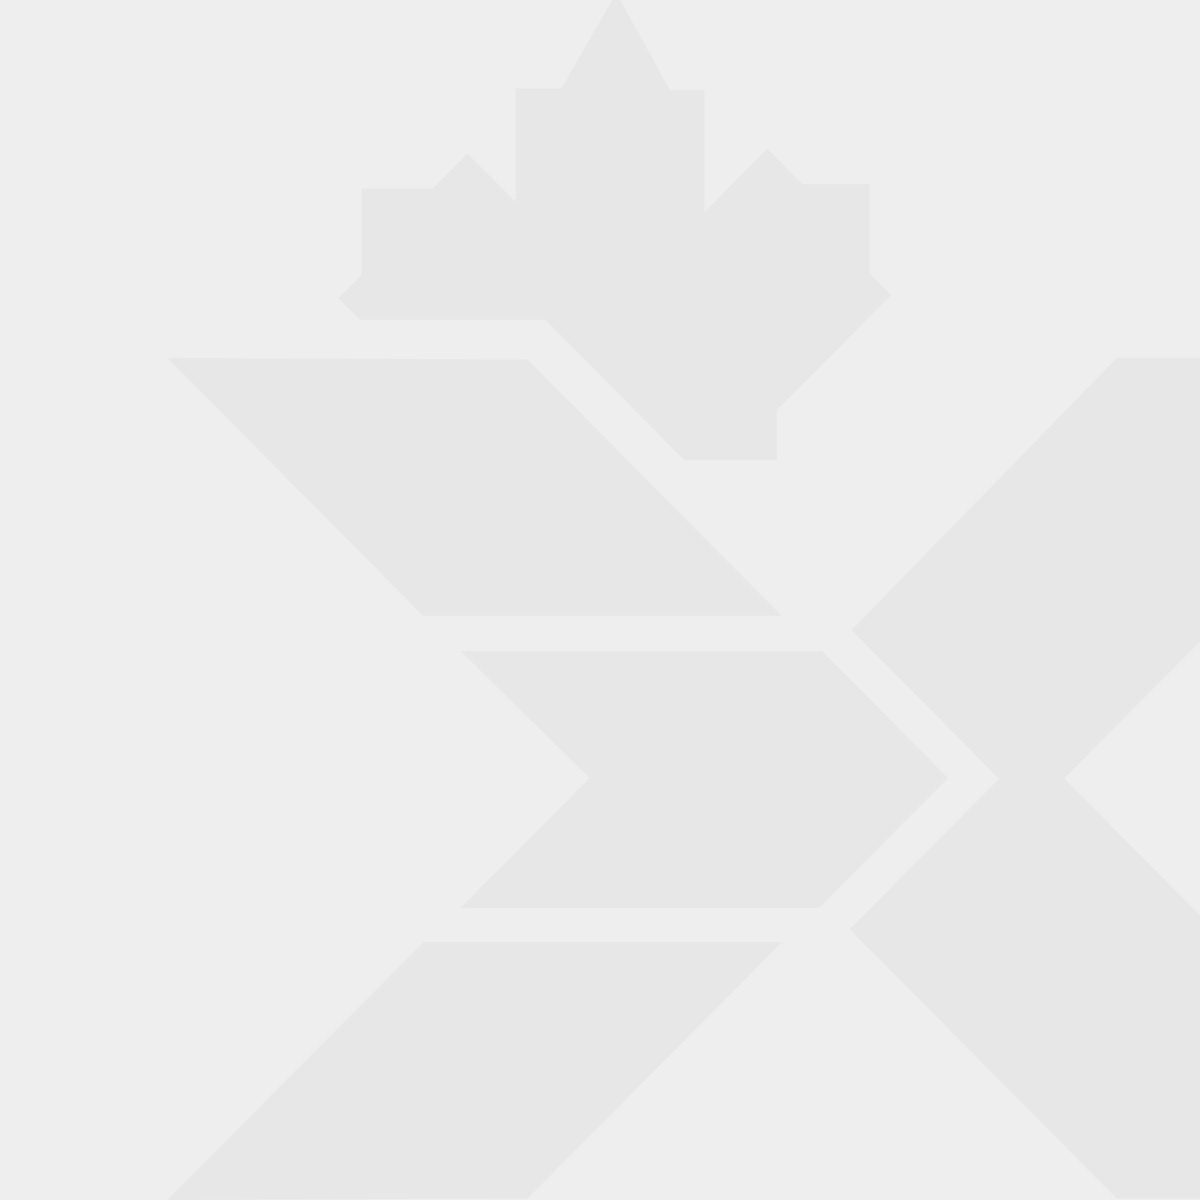 Mil-Spex Tactical Canada Patch